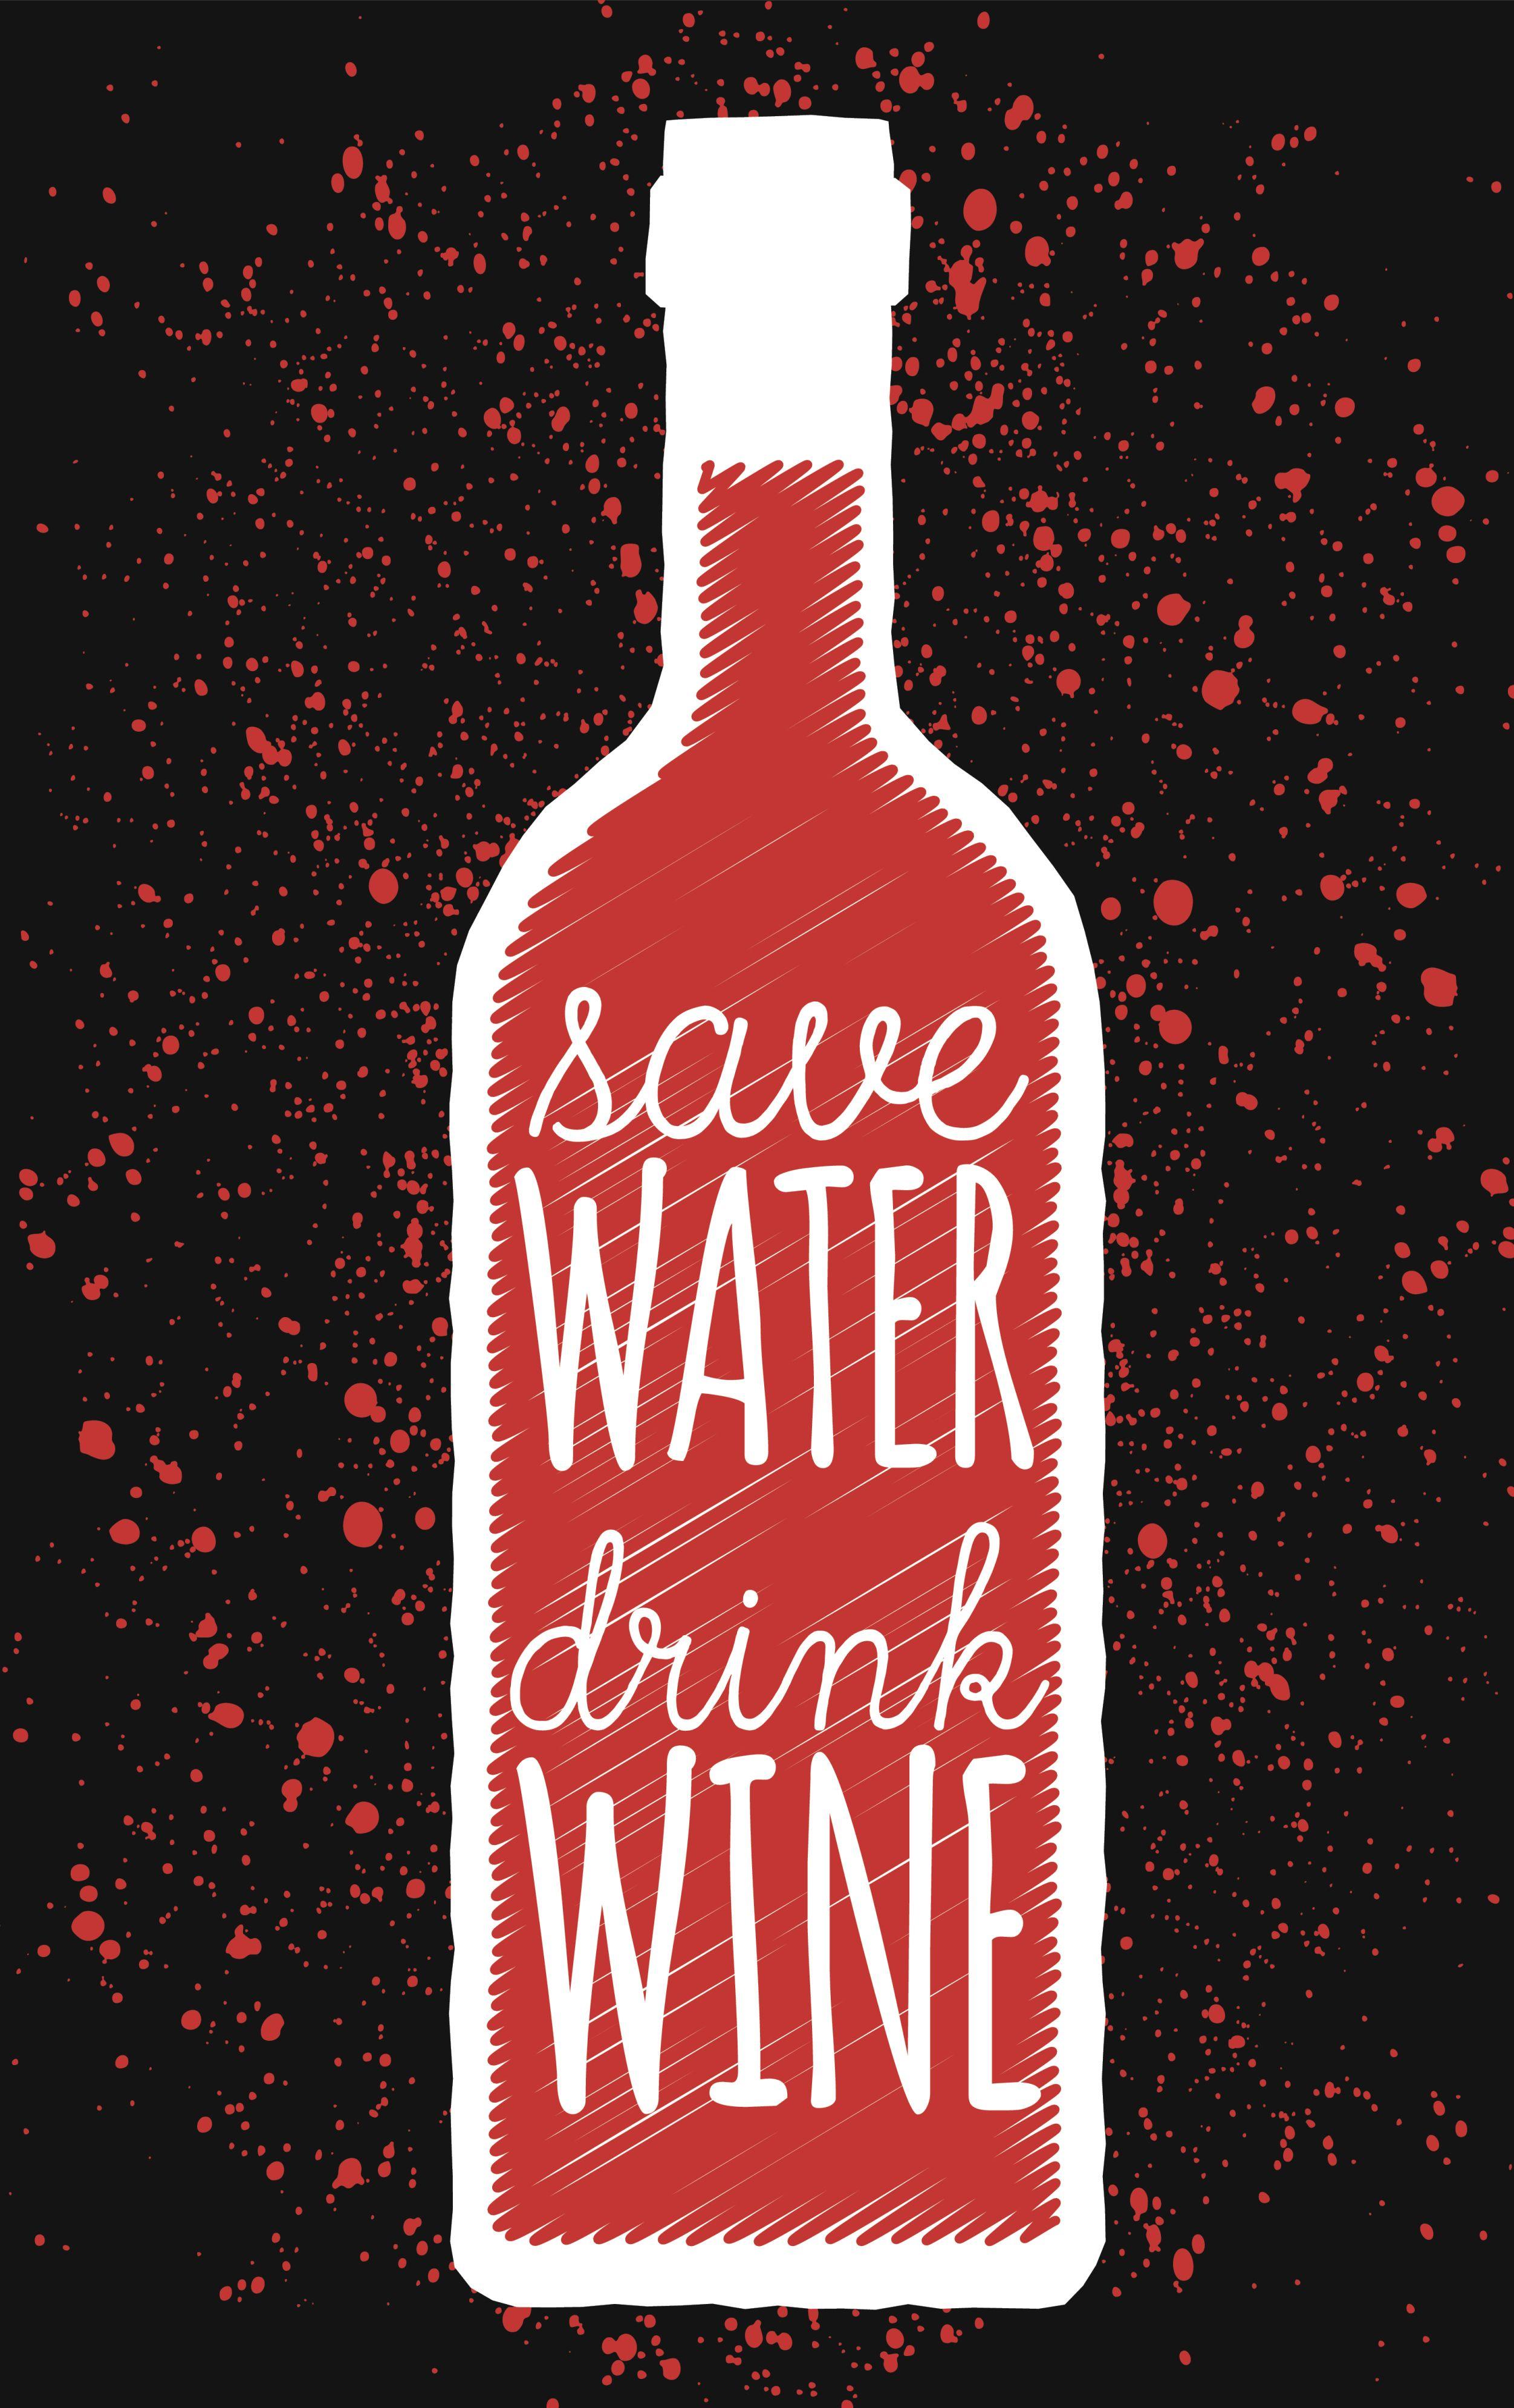 So True Save Water Drink Wine Wine Drinks Save Water Drink Wine Drinks